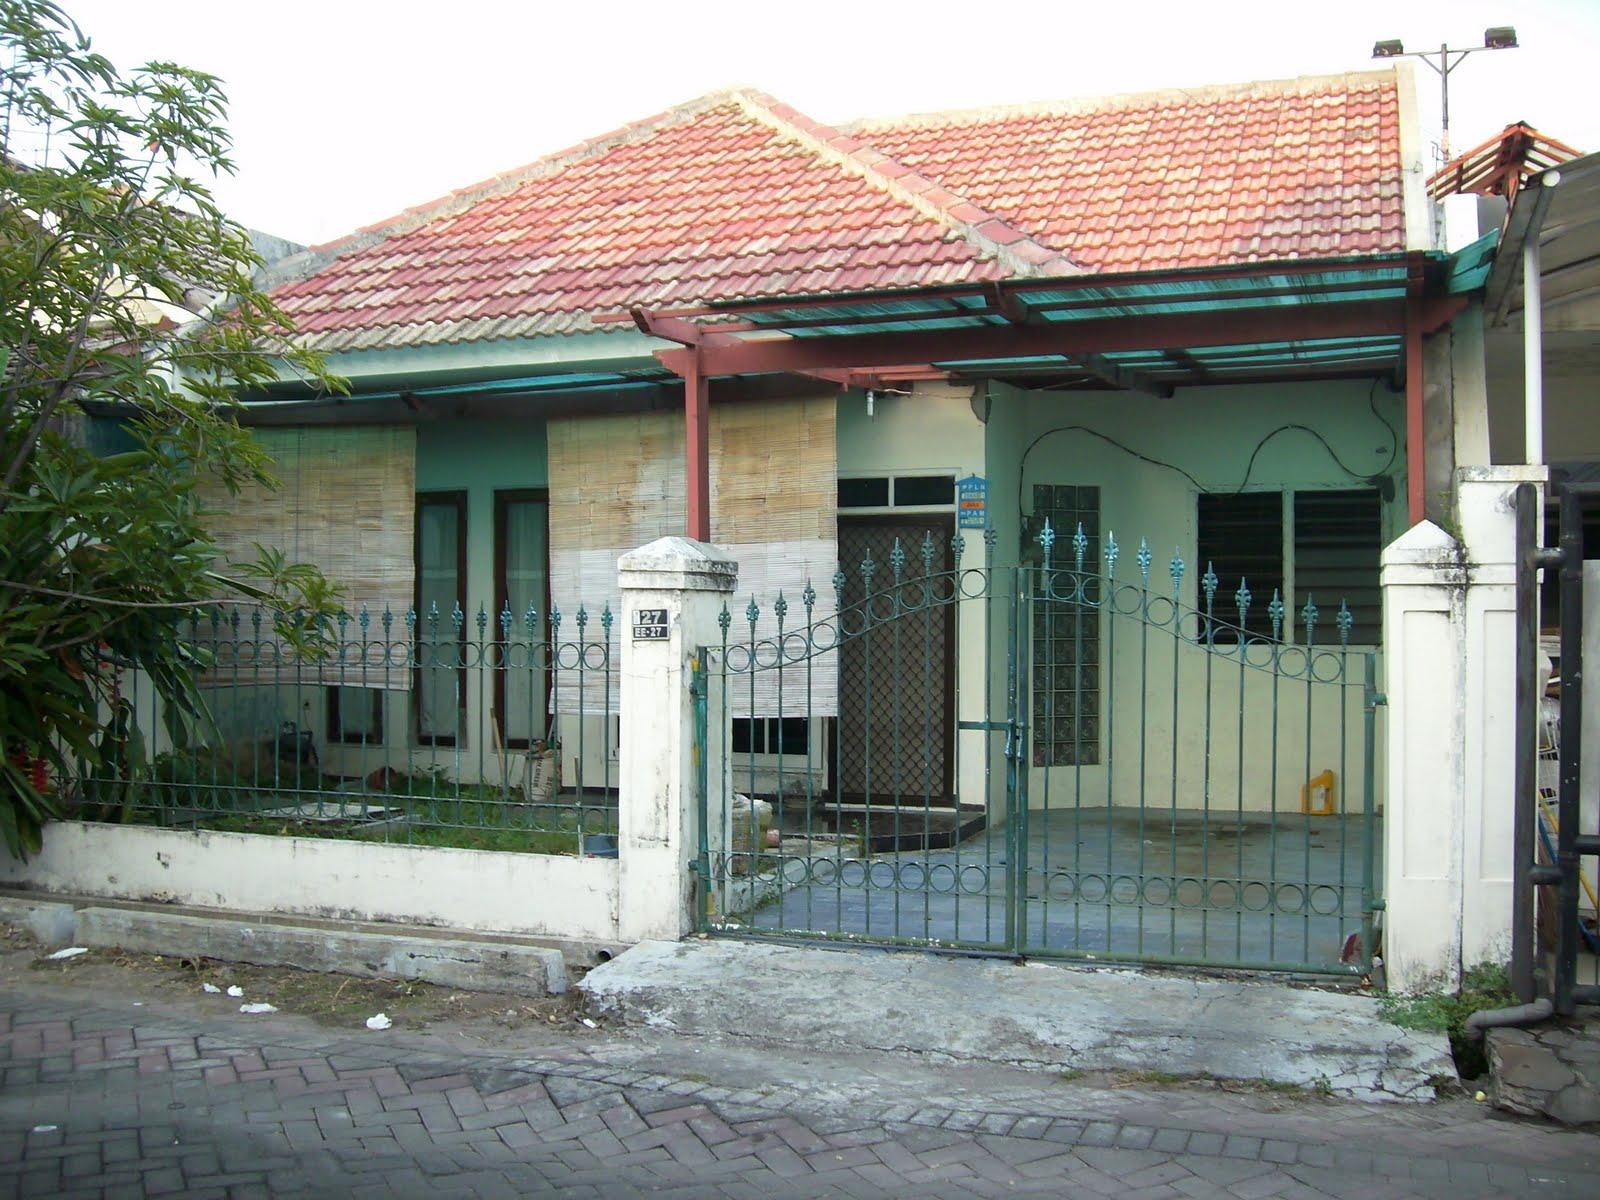 JUAL BELI SEWA PROPERTI: Rumah Dijual : Wonorejo Permai ...